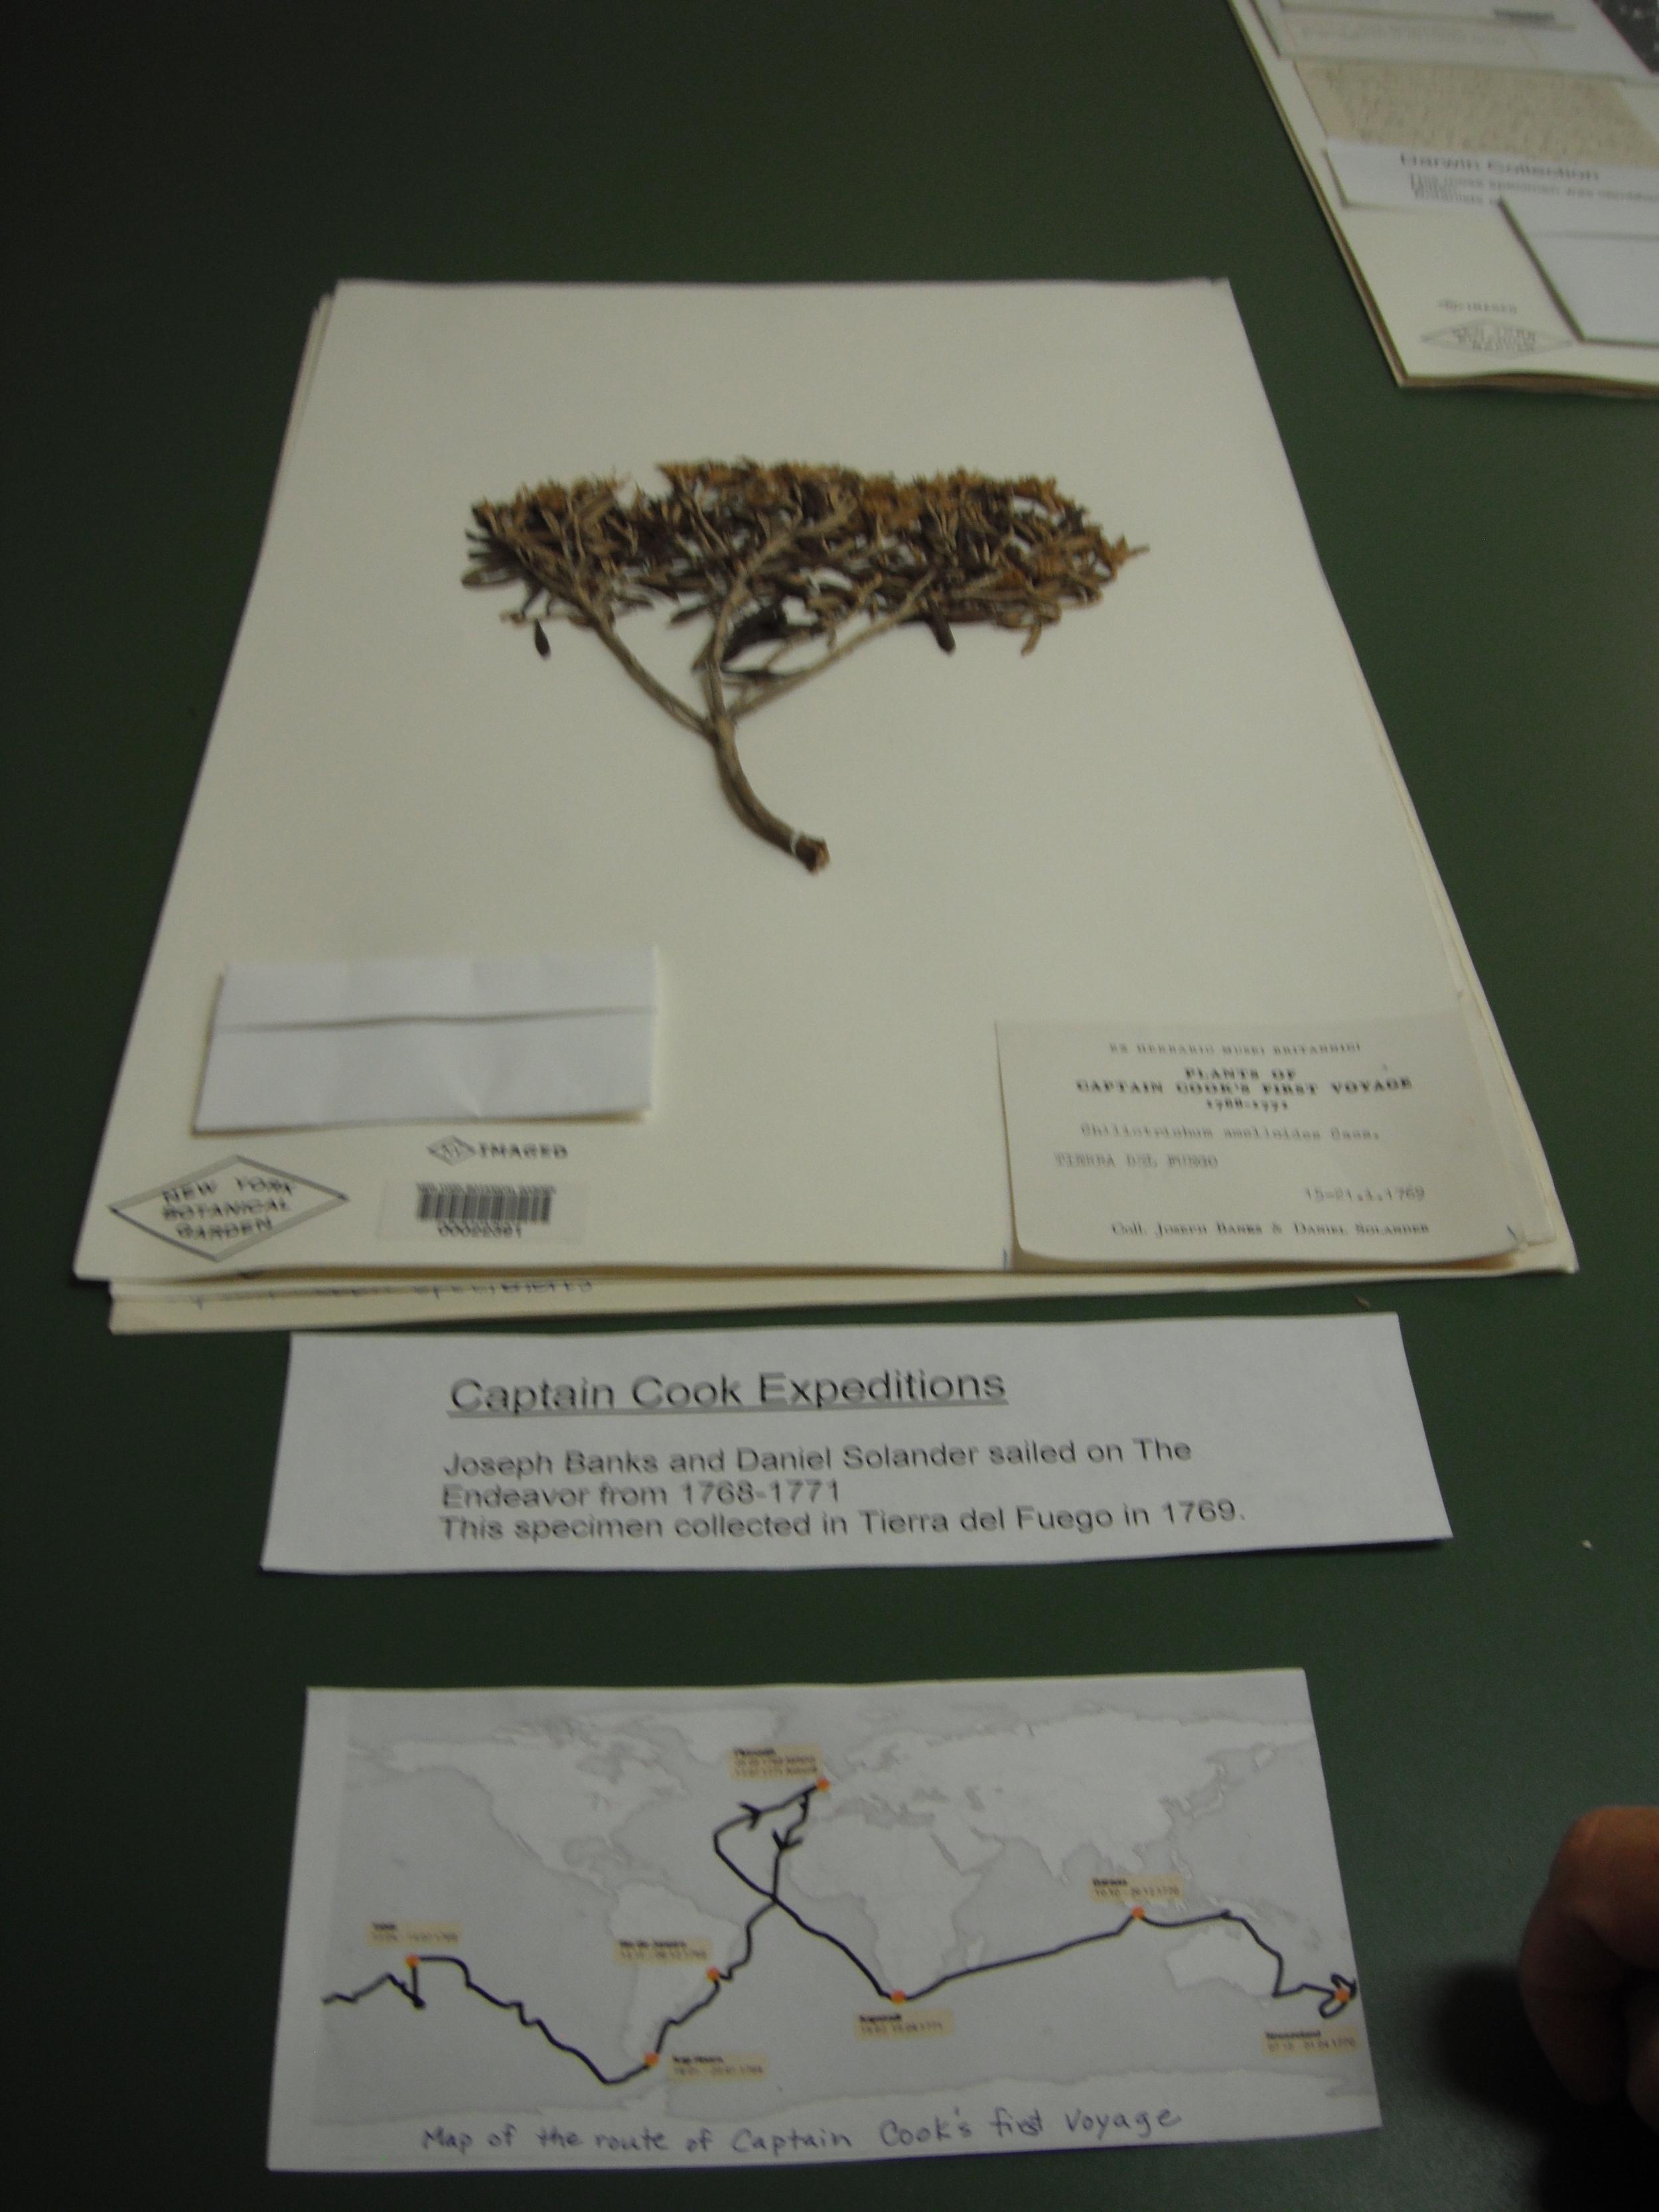 Specimen from Captain Cook's voyage